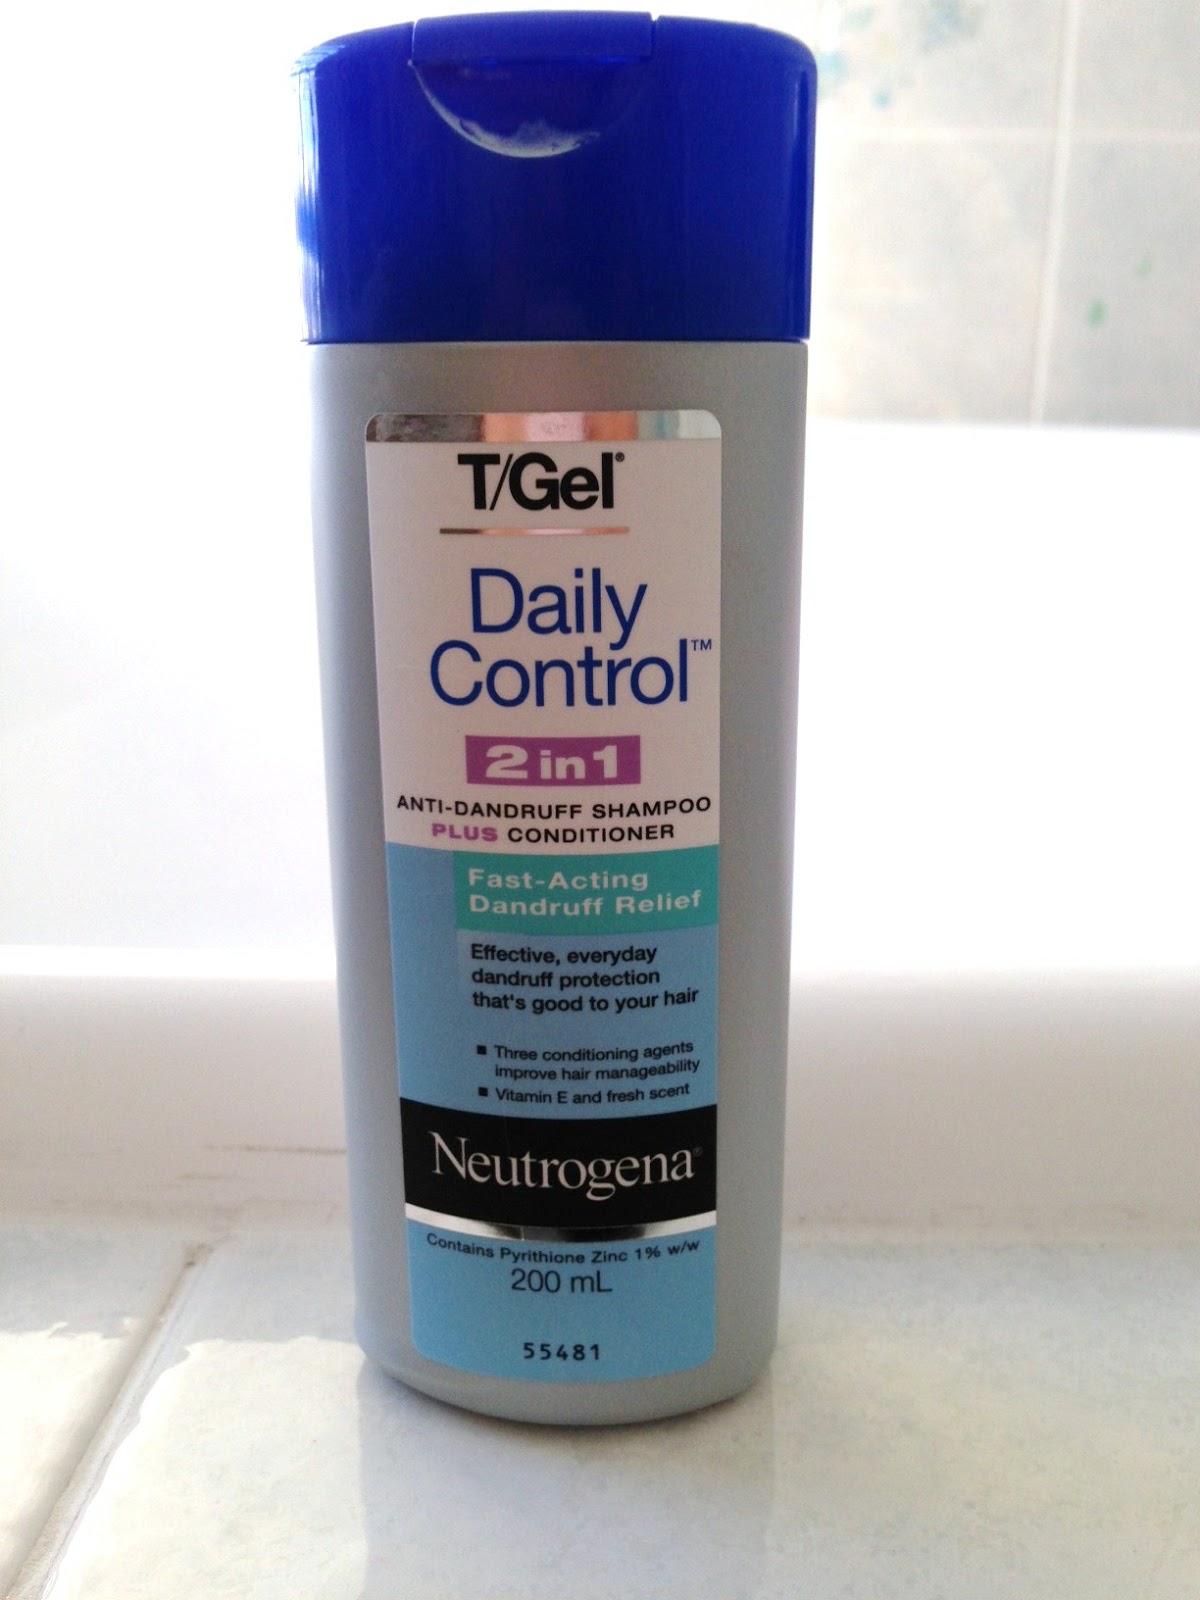 Neutrogena T/Gel Daily Control 2 in 1 Anti-Dandruff Shampoo